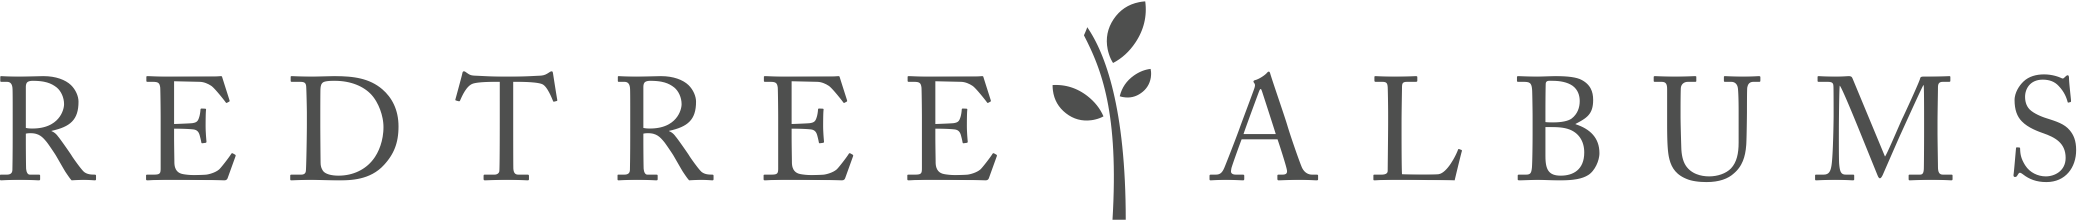 redtree_albums_logo_gray.png